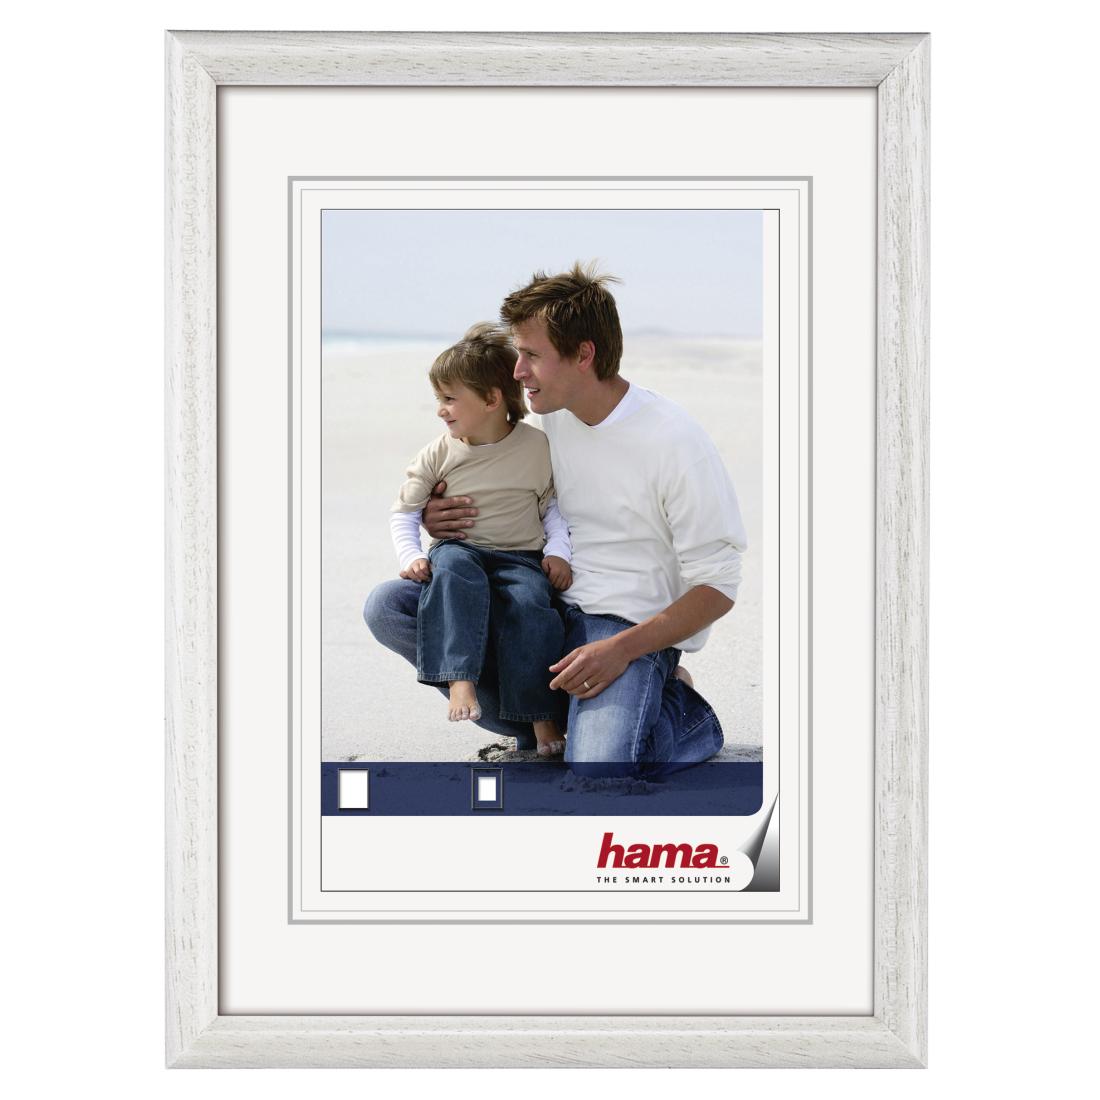 00064681 Hama Wooden Frame \